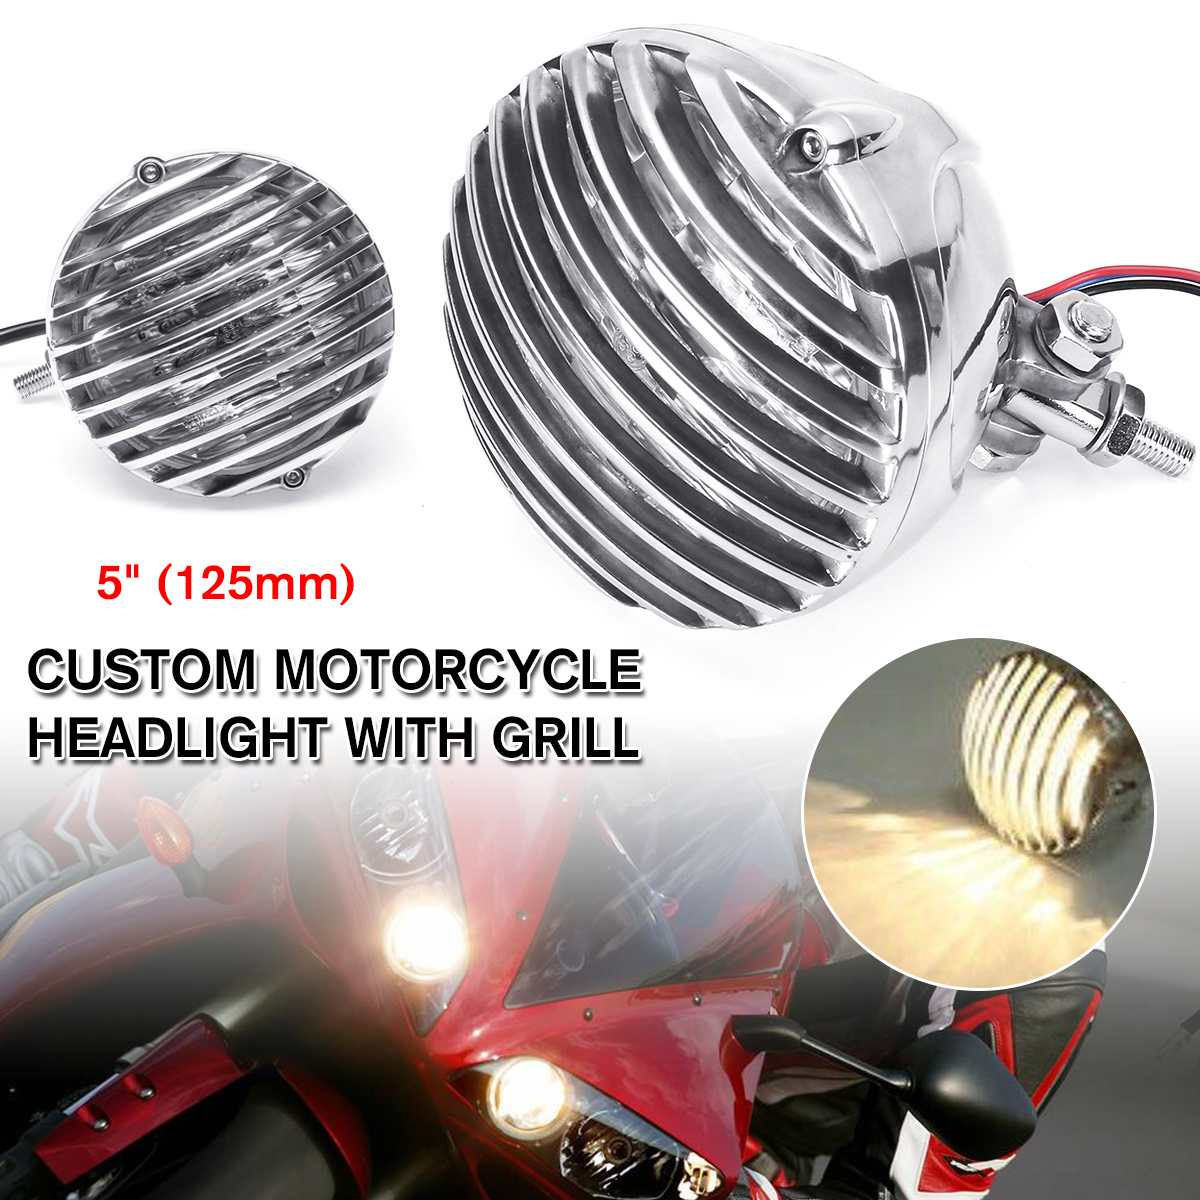 NEW Motorcycle LED Retro Headlight Head Light Grill Aluminum For Harley, Chopper, Bobber, Cafe Racer And Custom Motorcycles